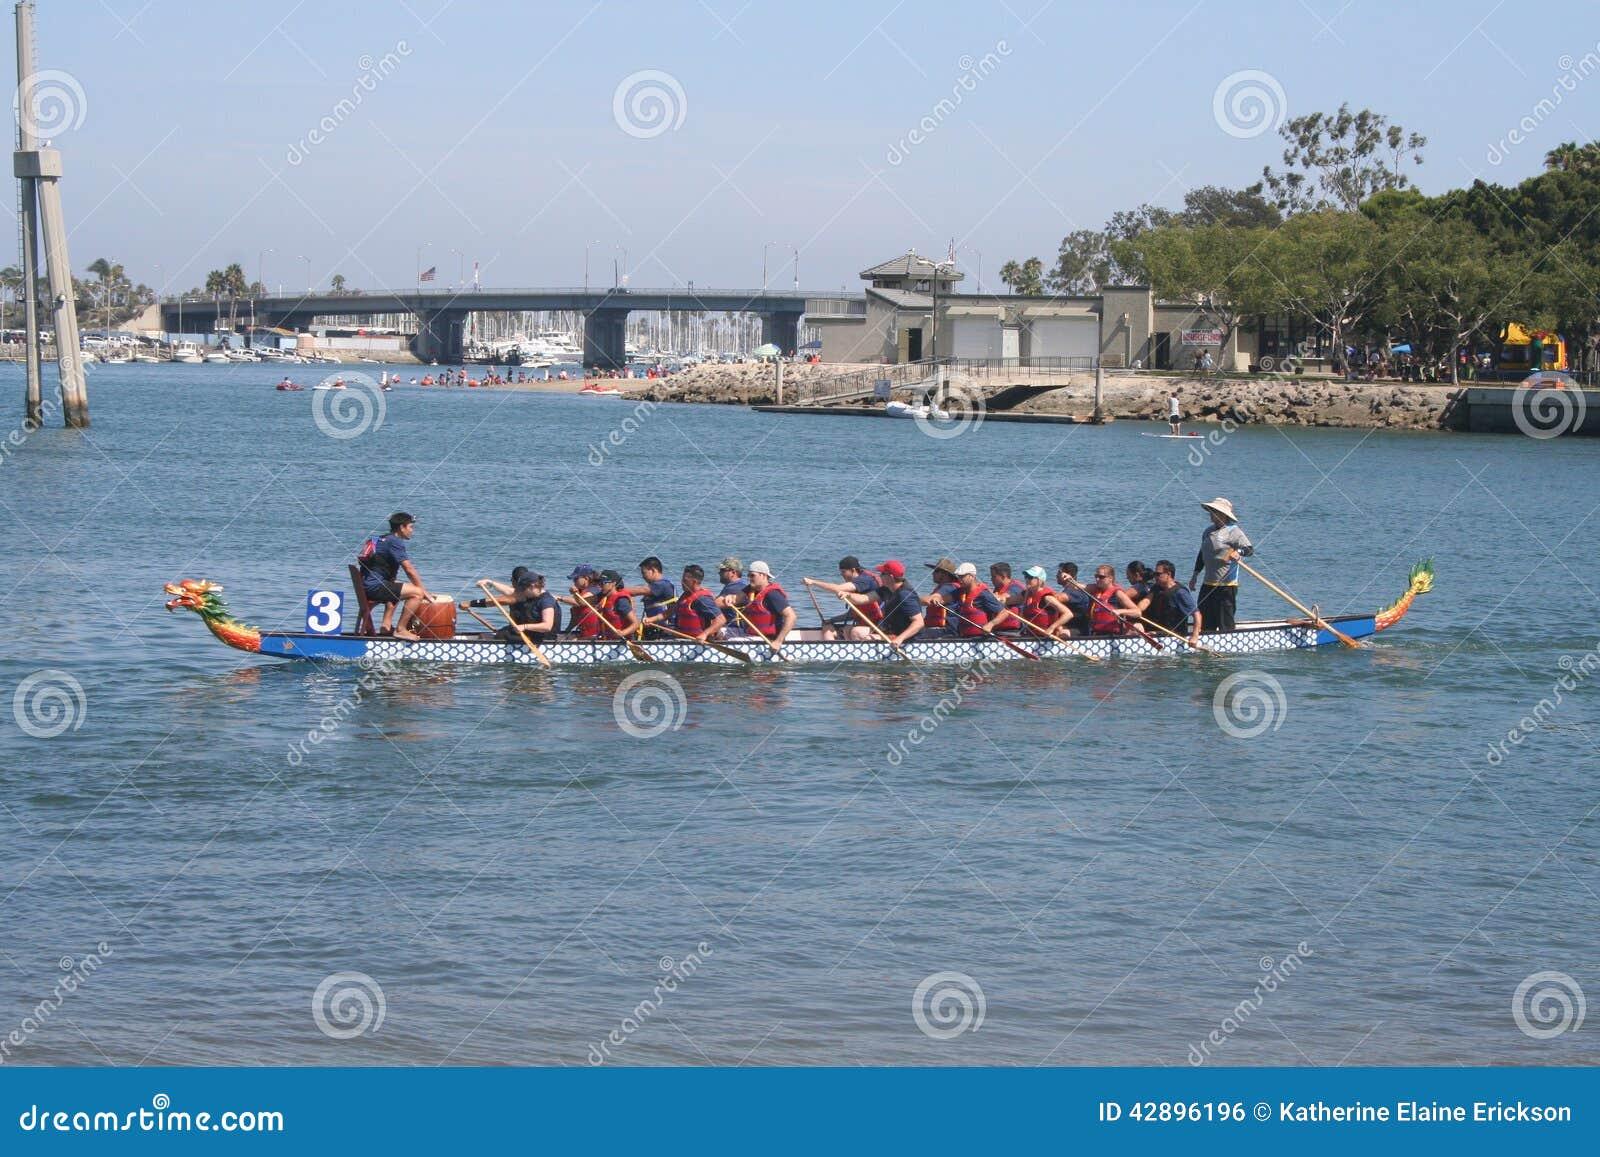 Long Beach Dragon Boat Festival Race Results